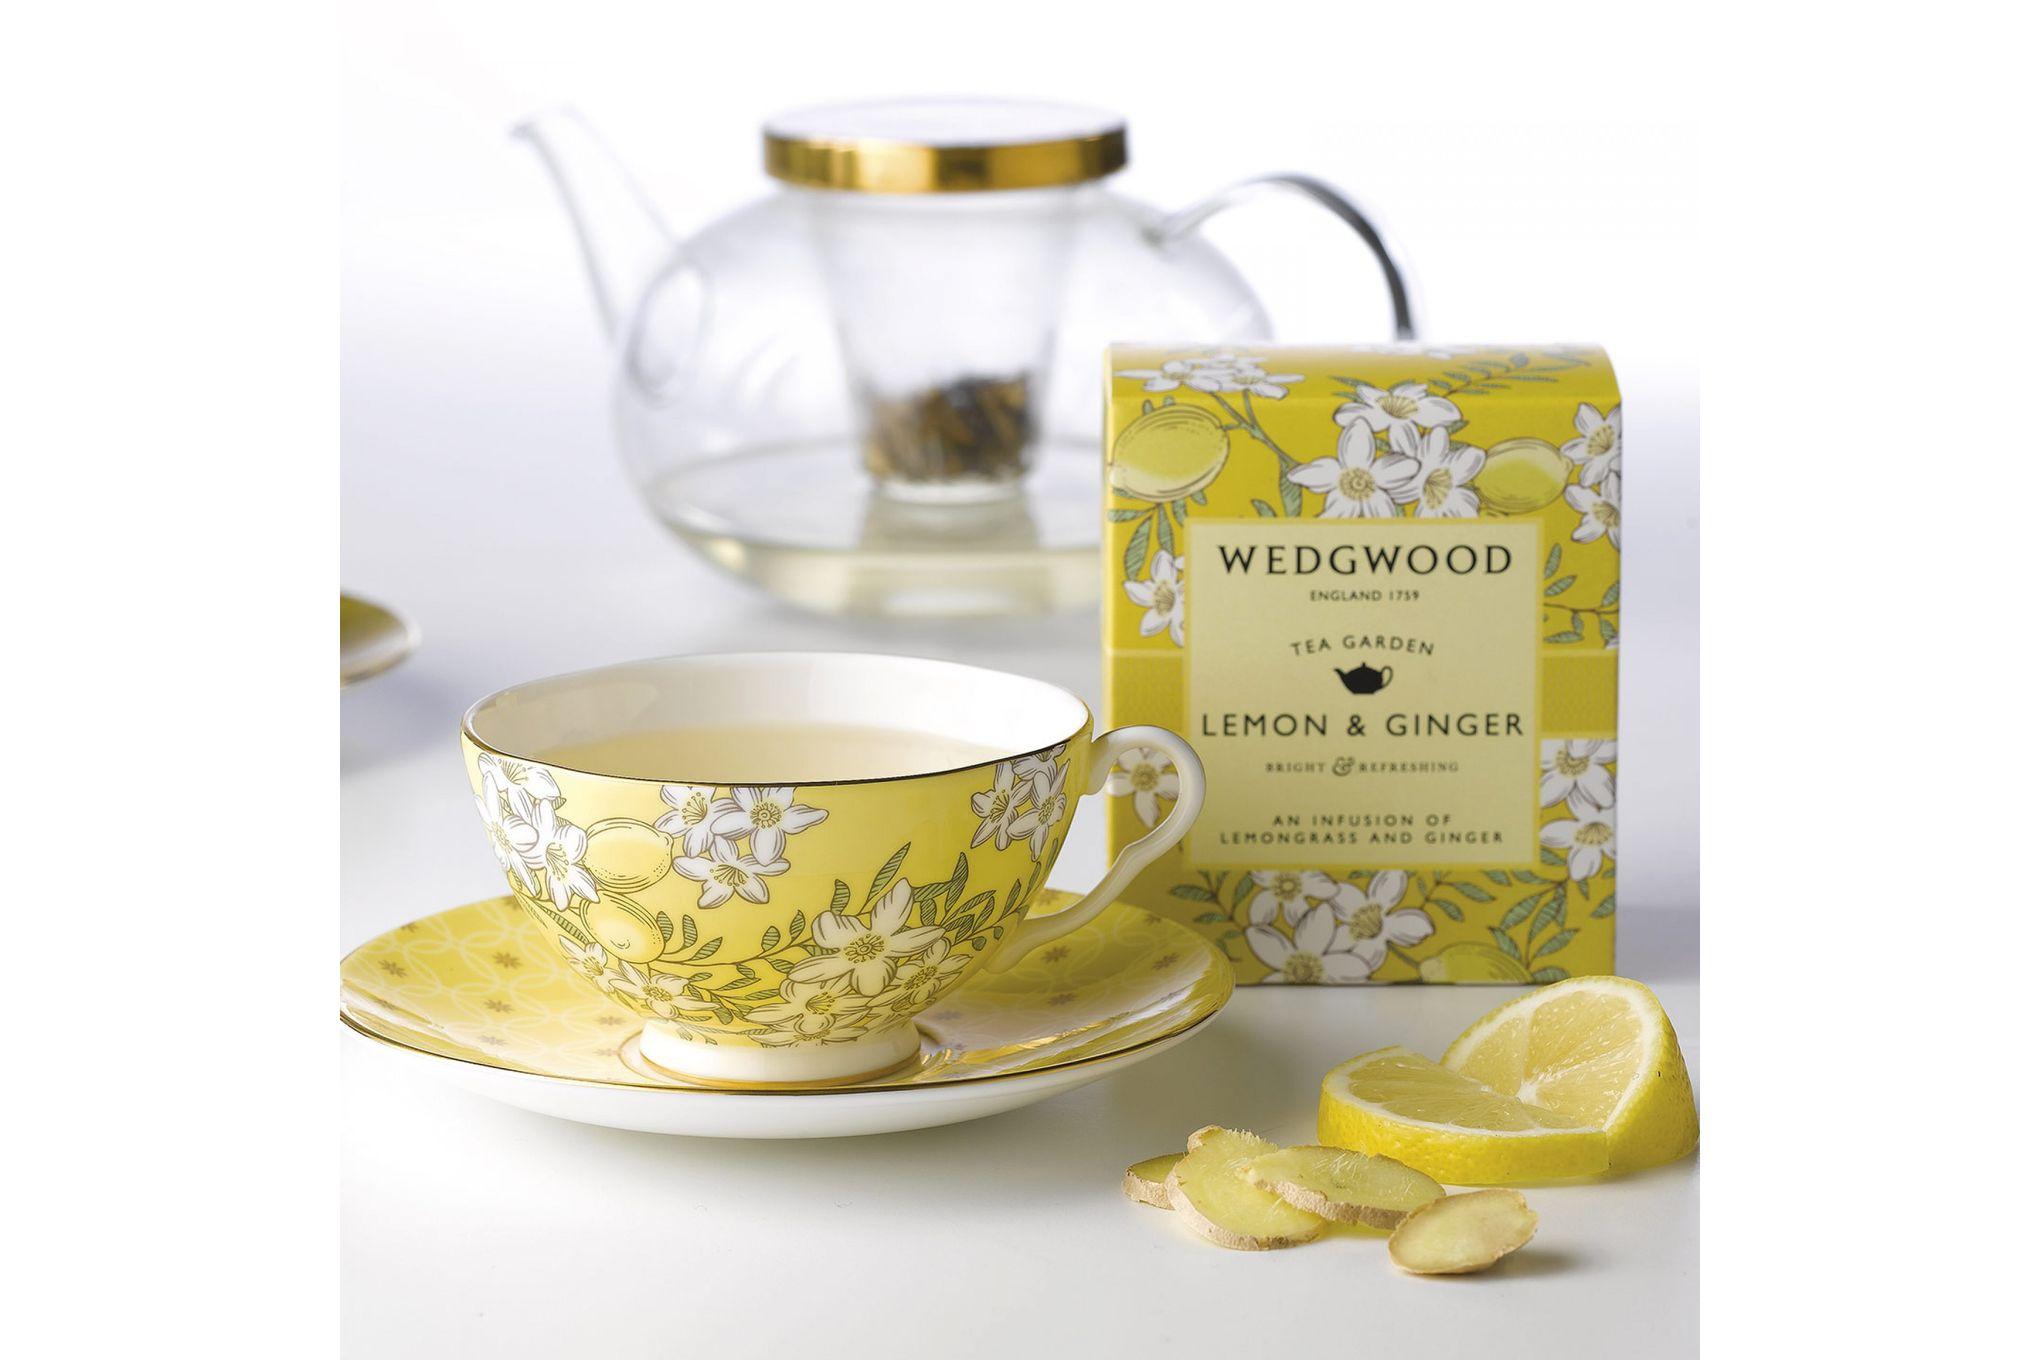 Wedgwood Tea Garden 3 Piece Set Plate 21cm, Teacup & Saucer Lemon & Ginger thumb 2